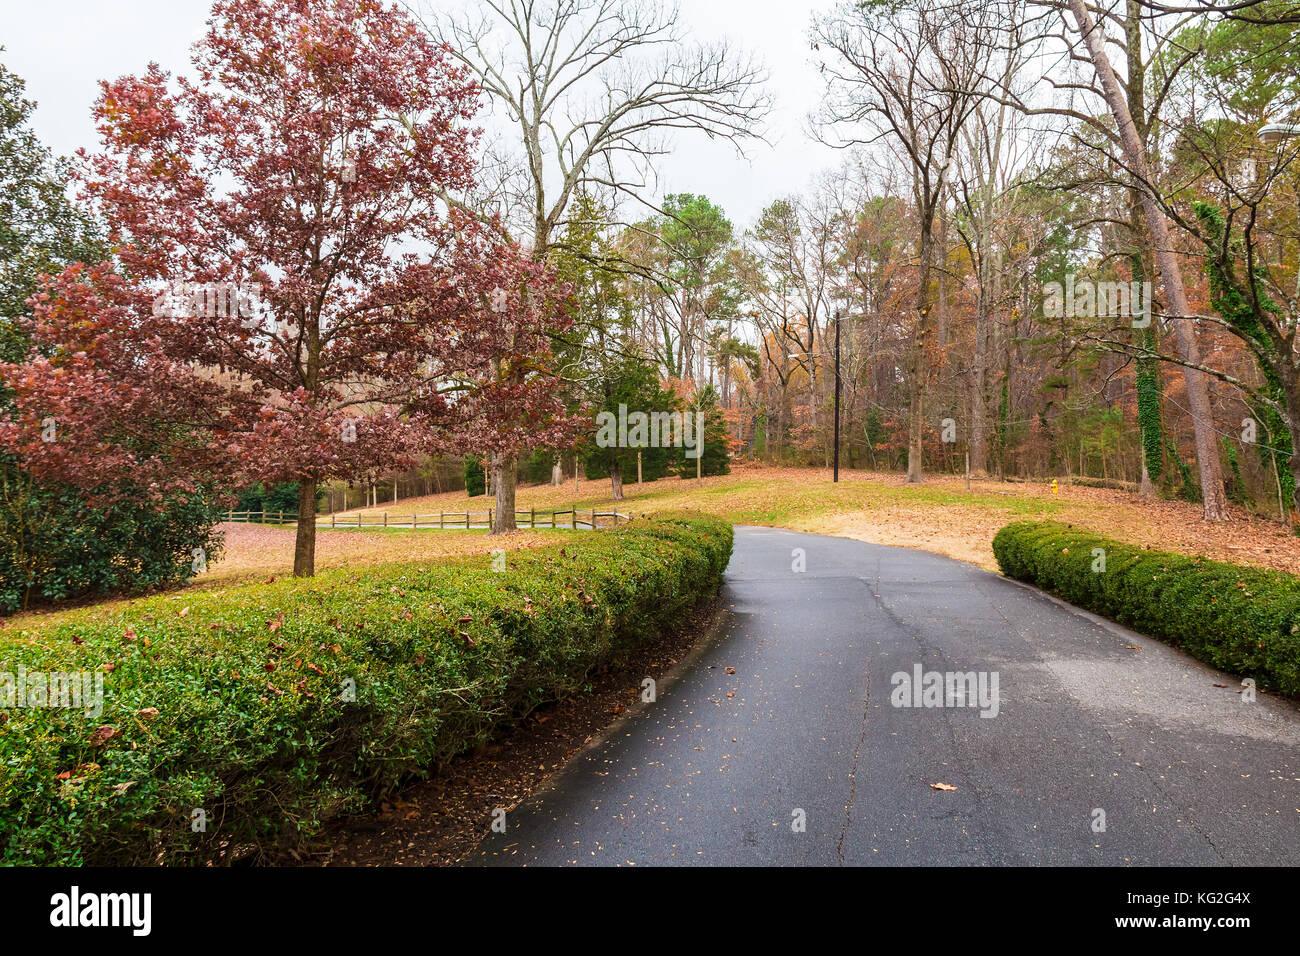 Asphalt road in autumn Lullwater Park, Atlanta, USA Stock Photo